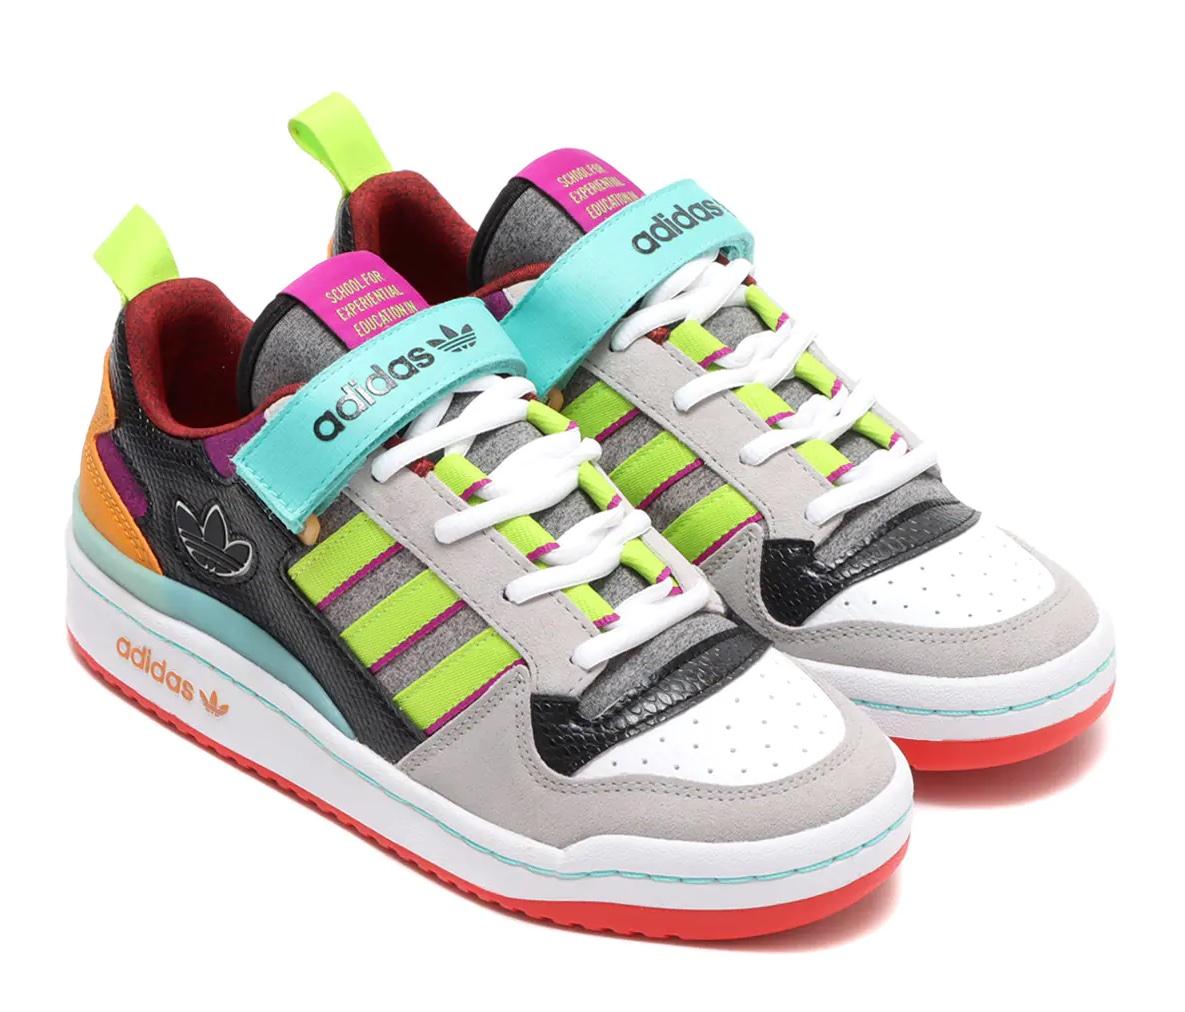 adidas FORUM LOW W SONIC FUCHSIA/PINK TINT/ACID MINT